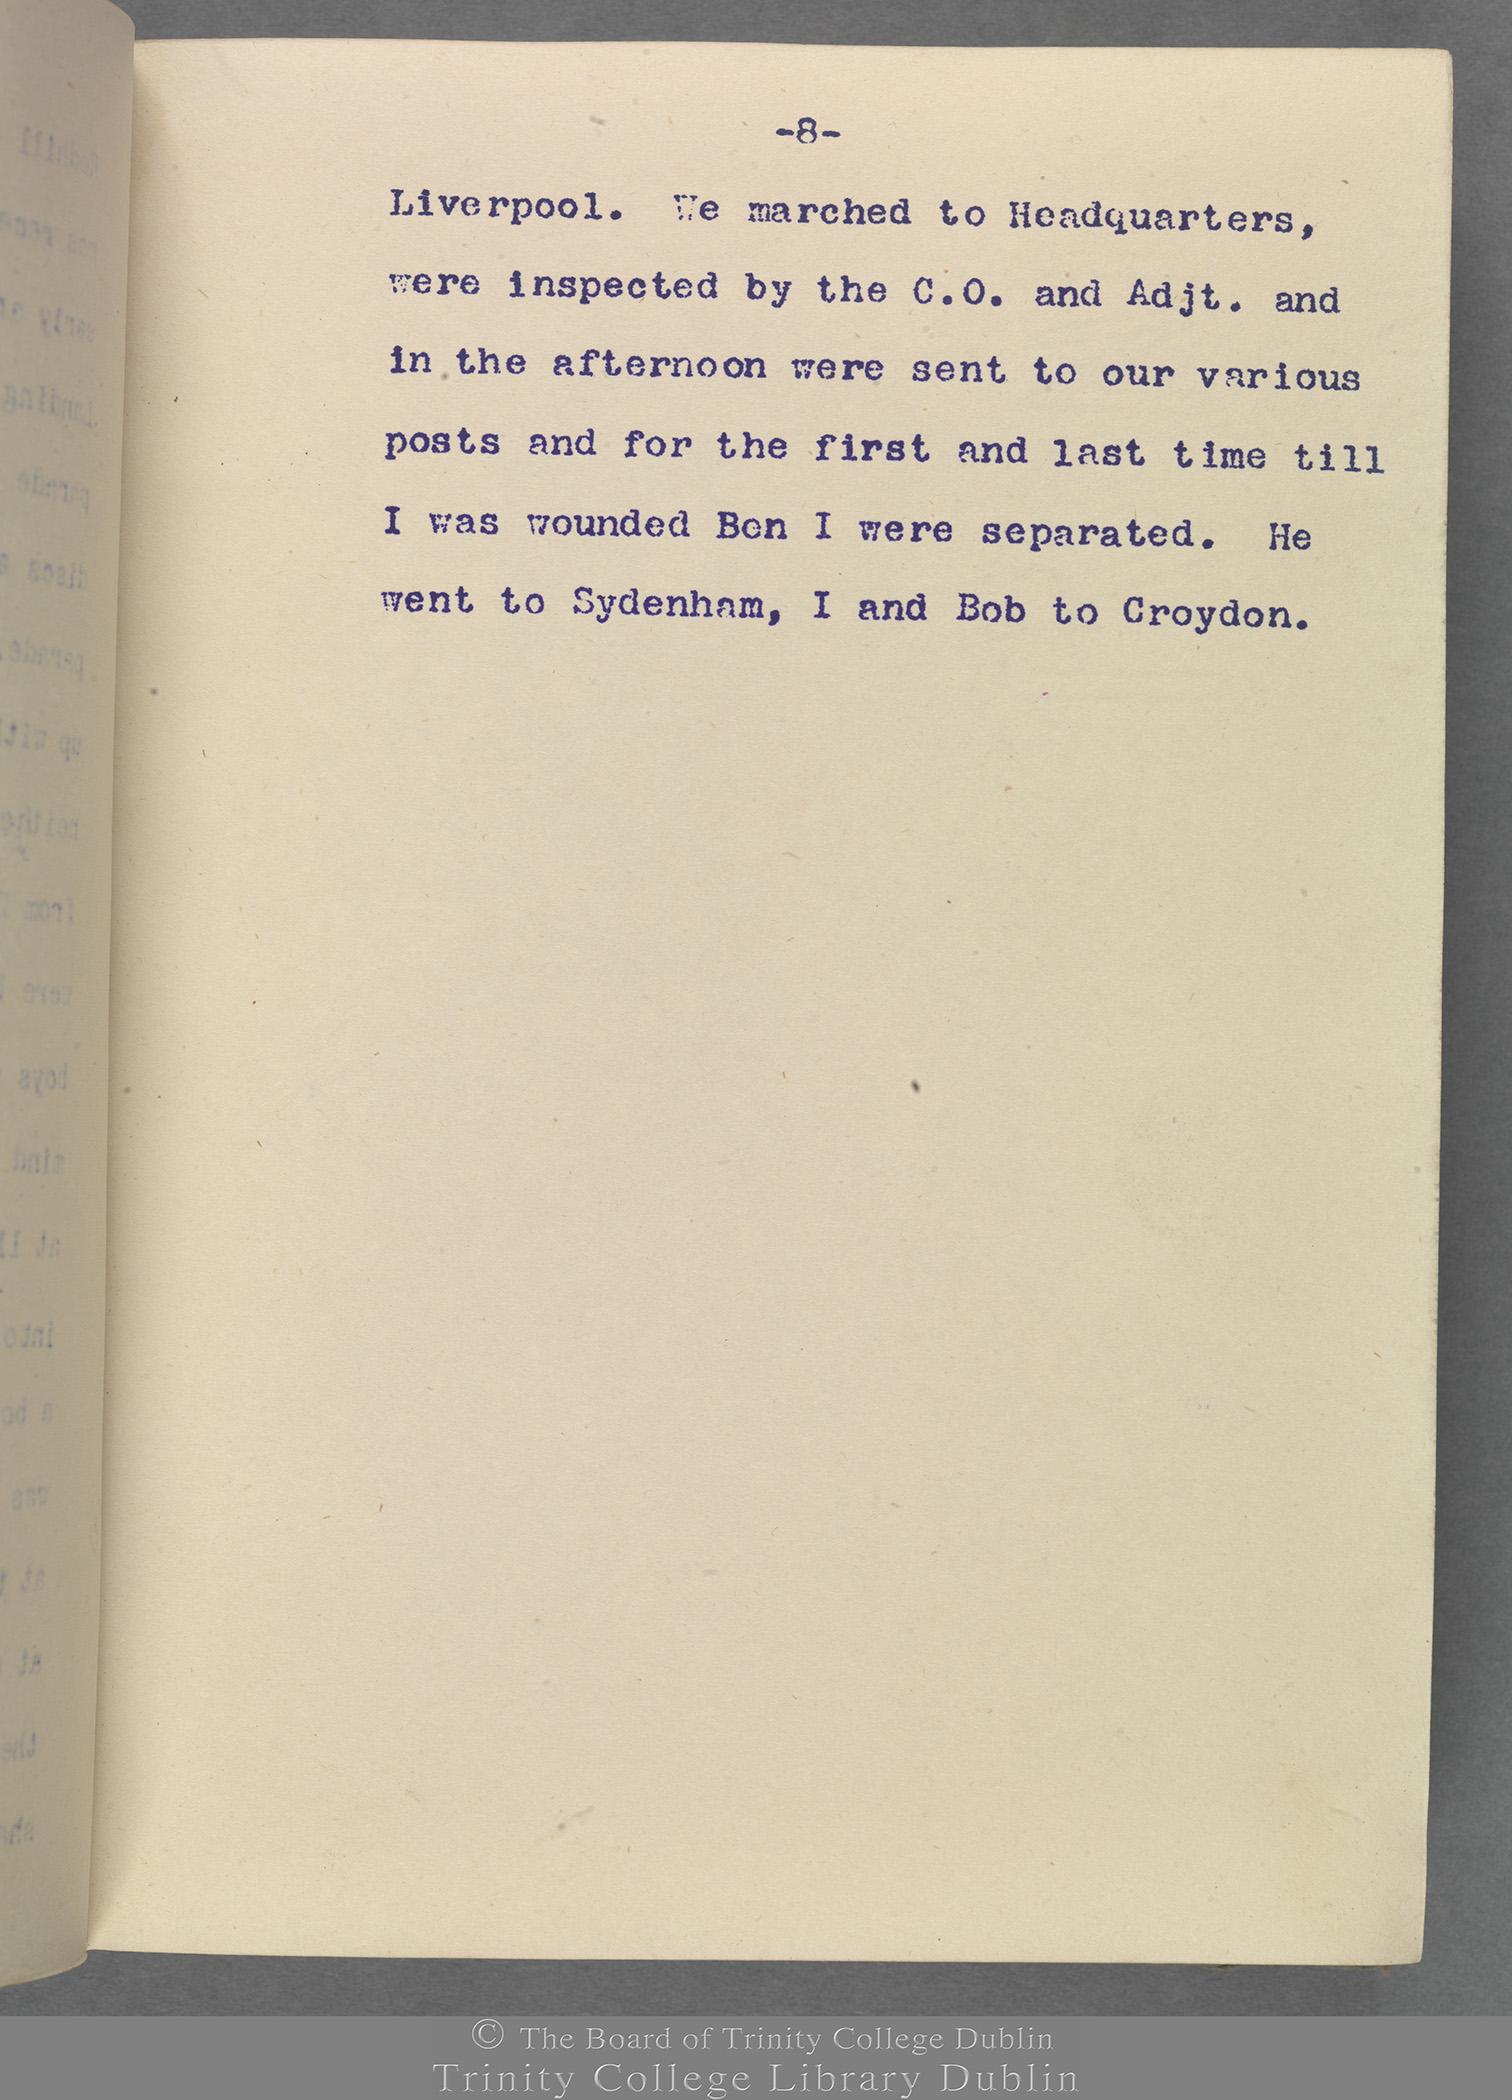 TCD MS 10853 folio 8 recto